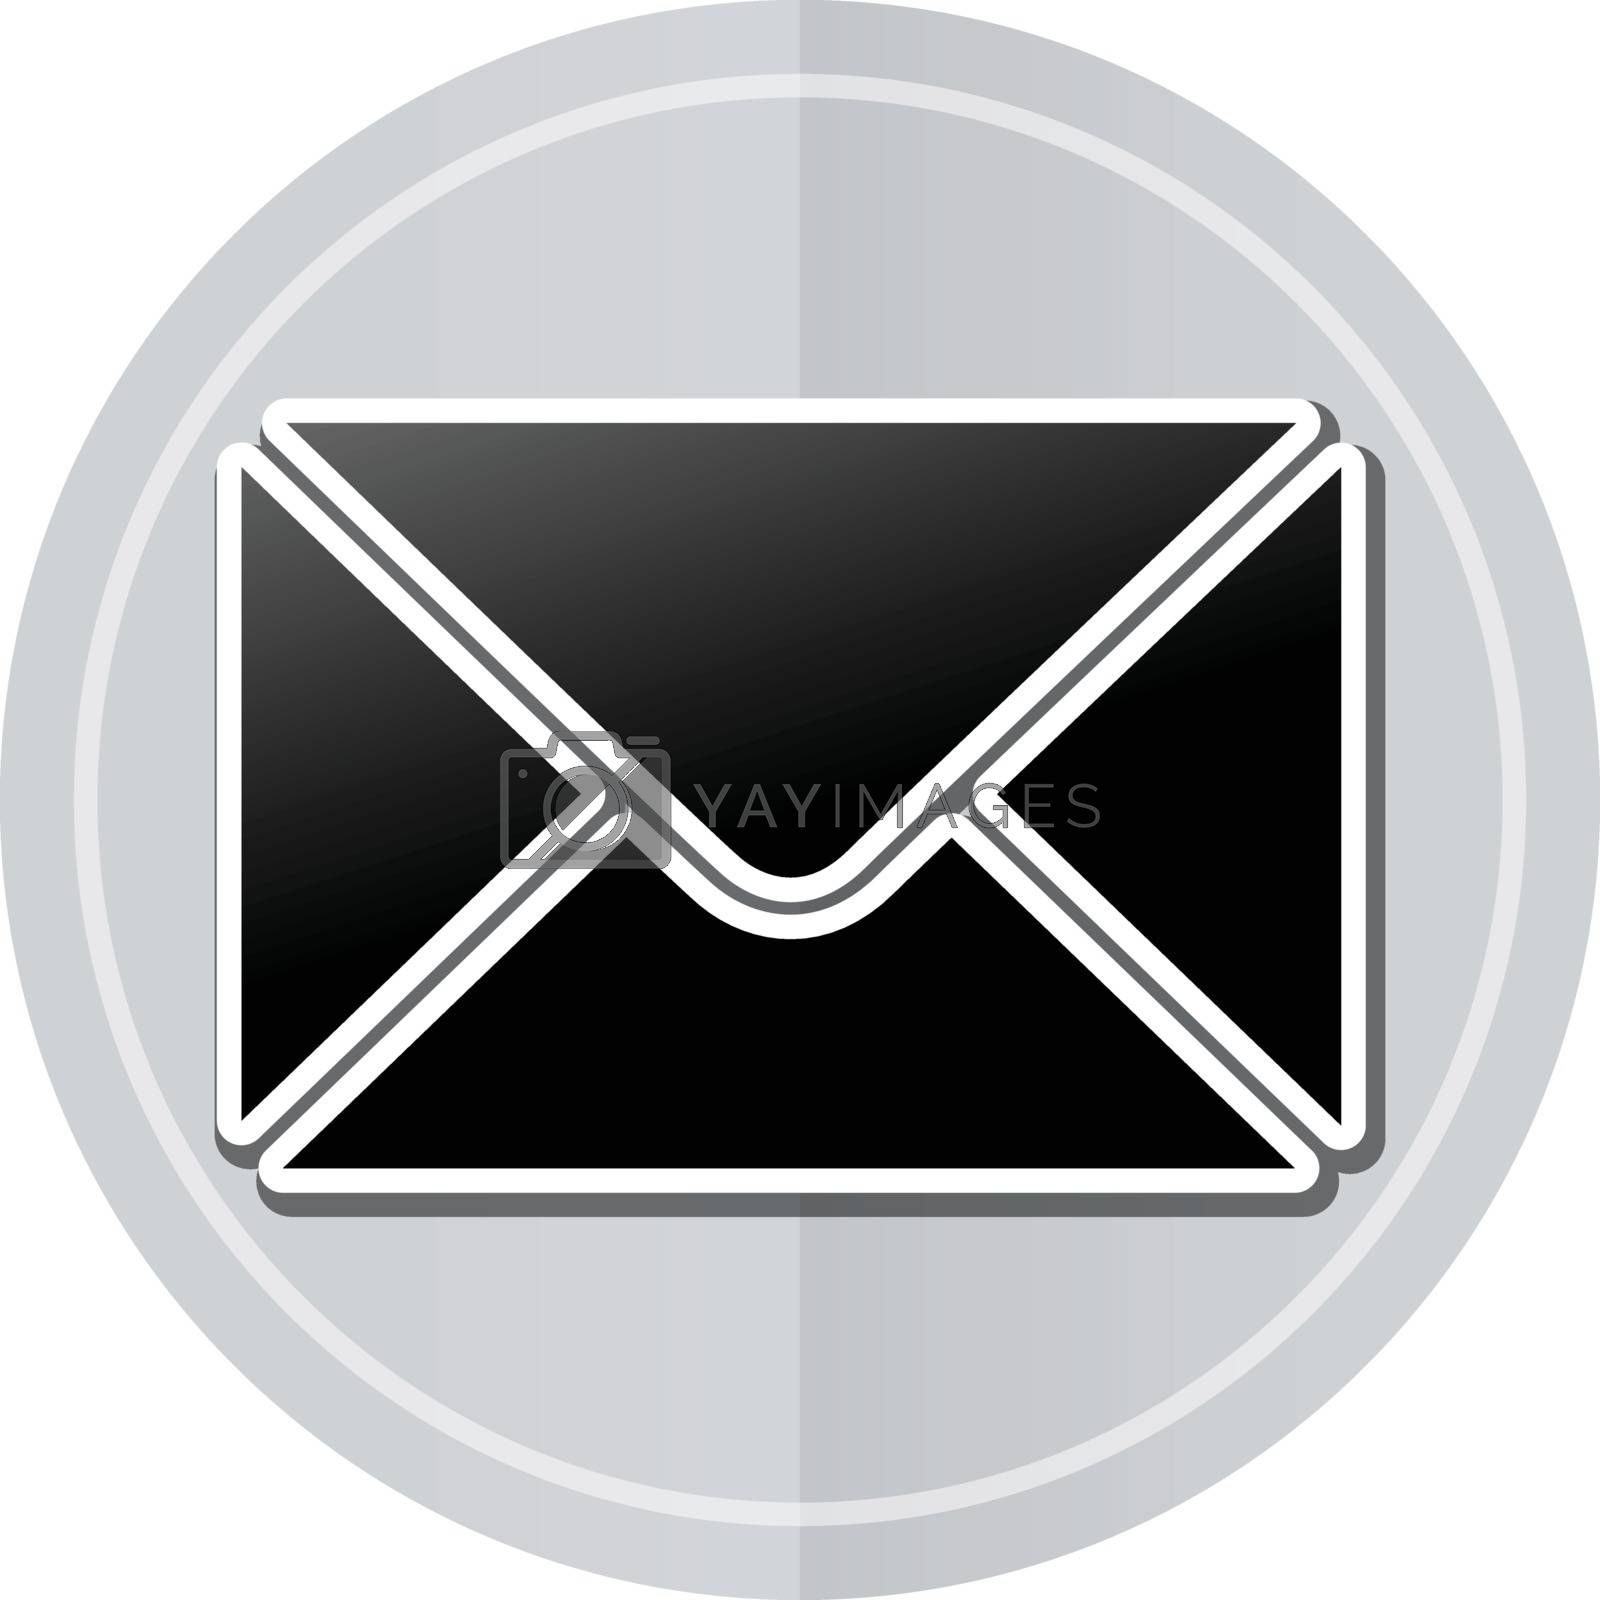 Illustration of envelope sticker icon simple design